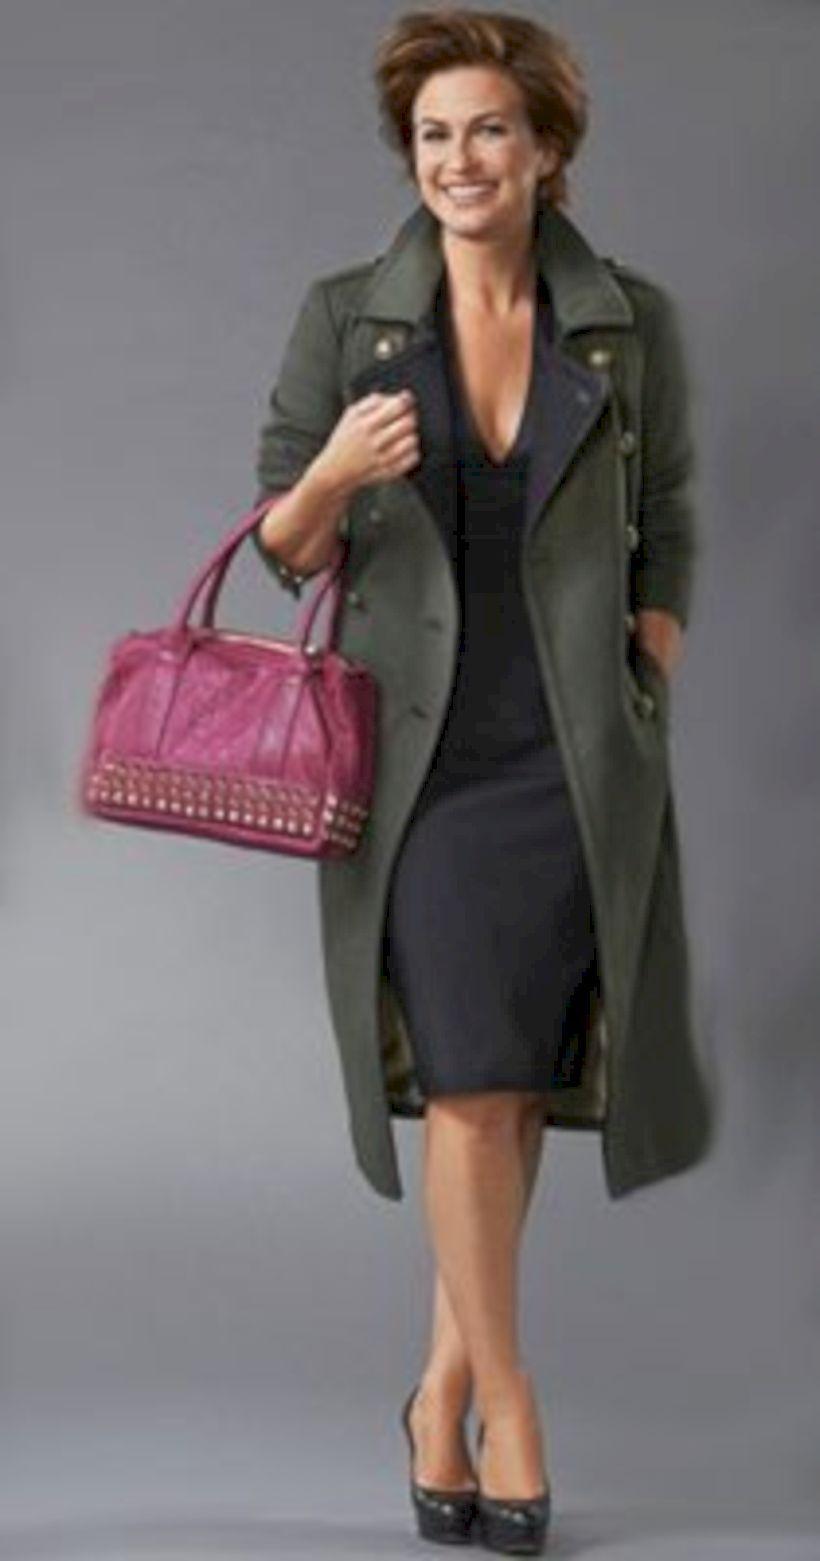 35 Charming Casual Styles For 40 Year Old Woman Ideas 40 Fashion Women Fashion Casual Fashion